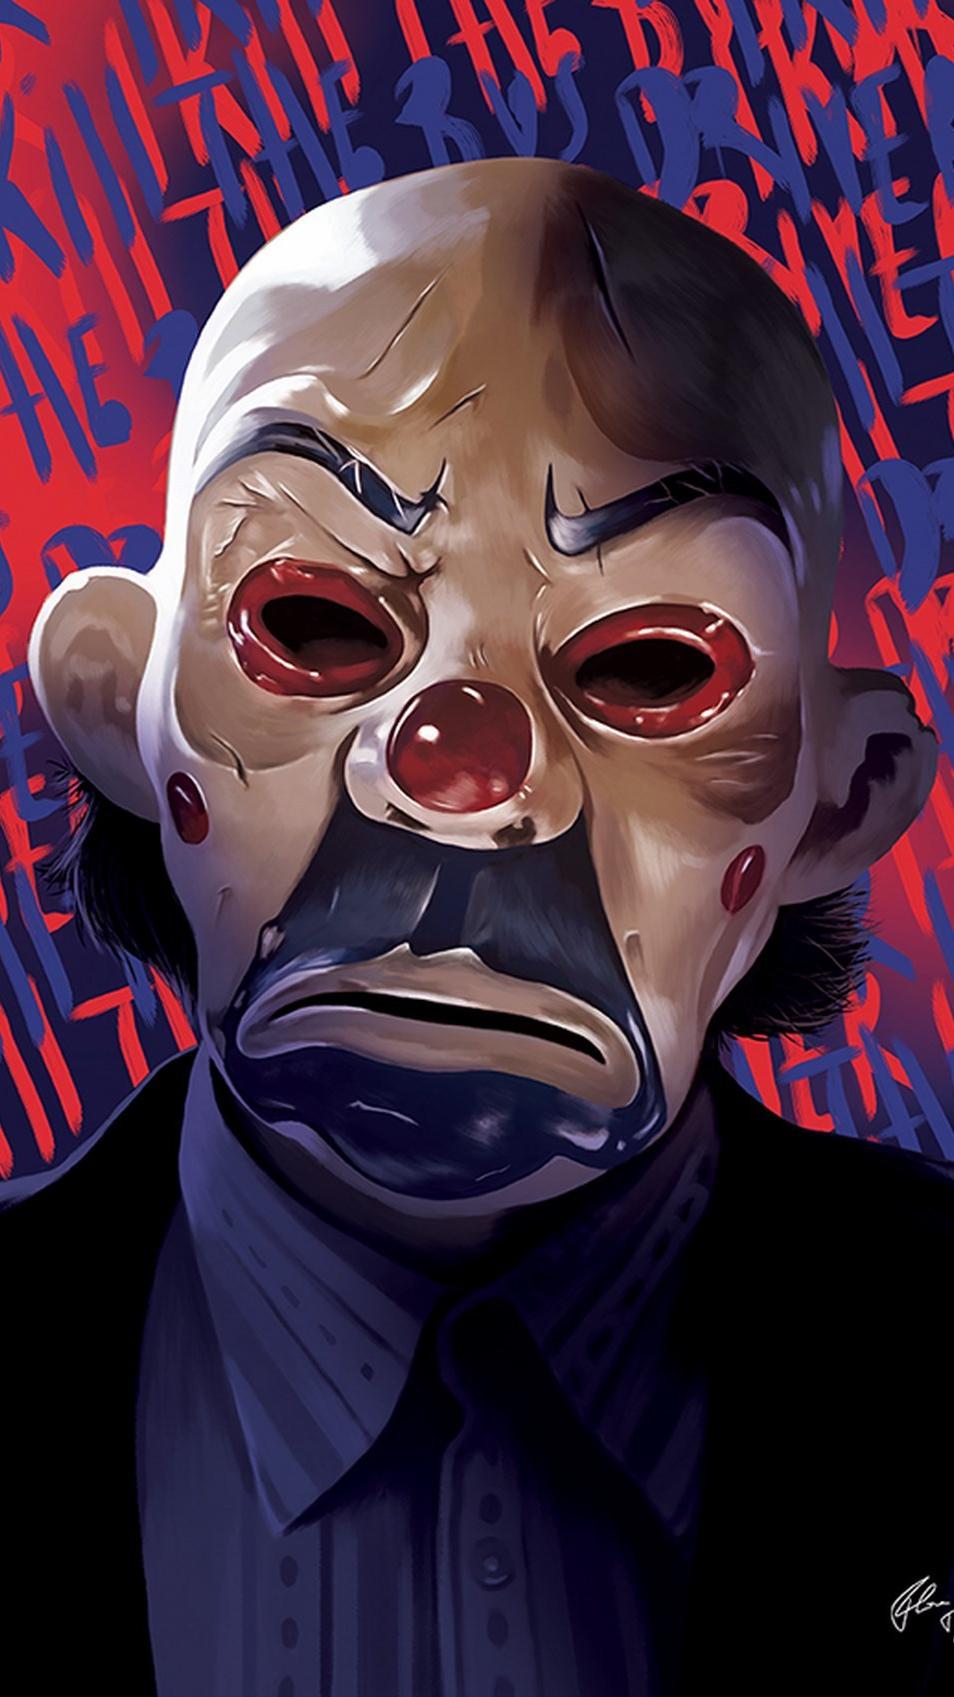 Wonderful Wallpaper Halloween Joker - Batman-Dark-Knight-Joker-iPhone-Wallpaper-iphoneswallpapers_com  2018_956387.jpg